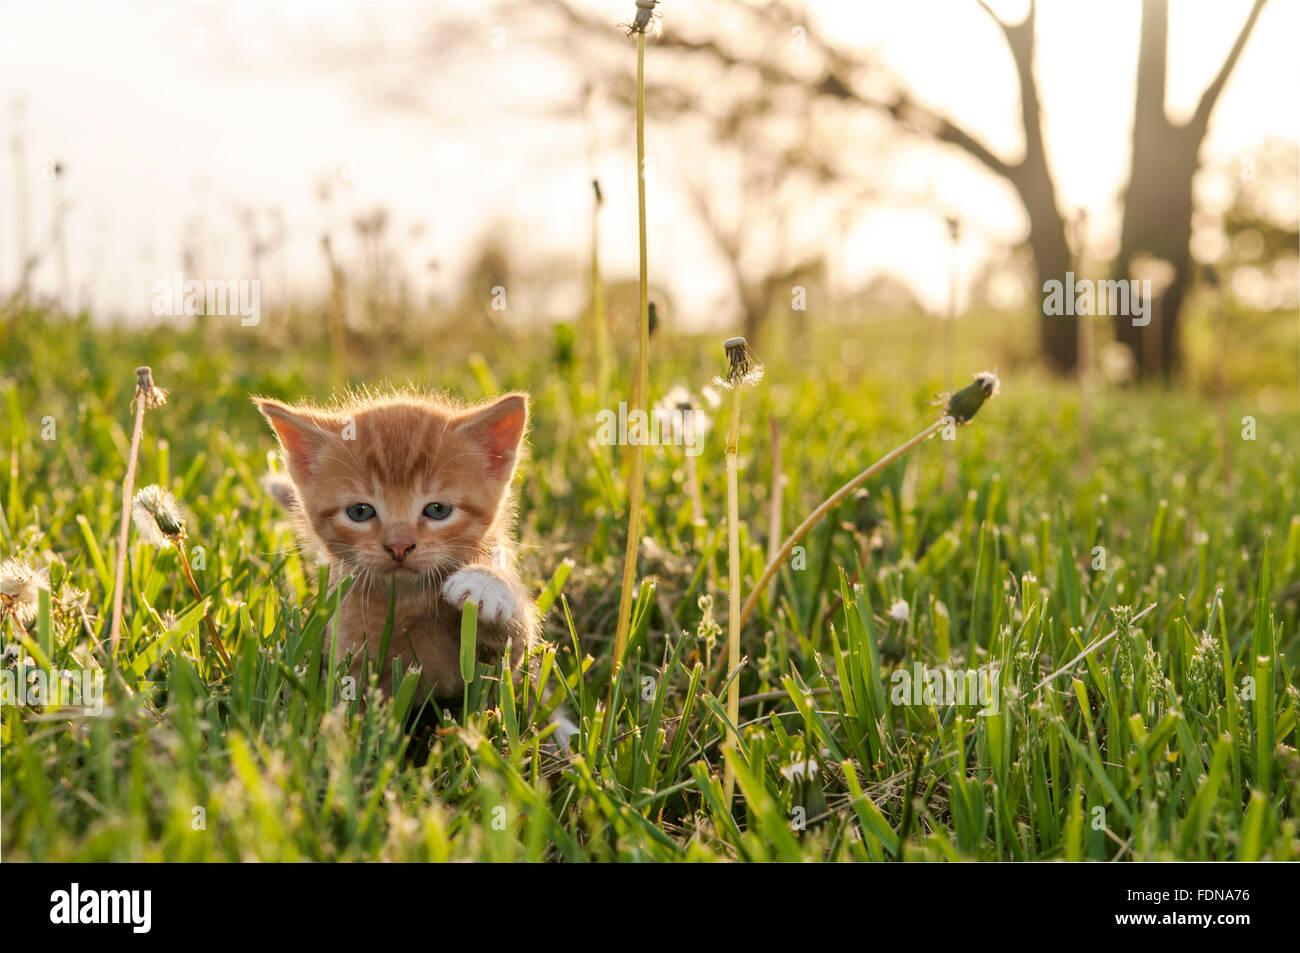 Kitten in tall grass - Stock Image